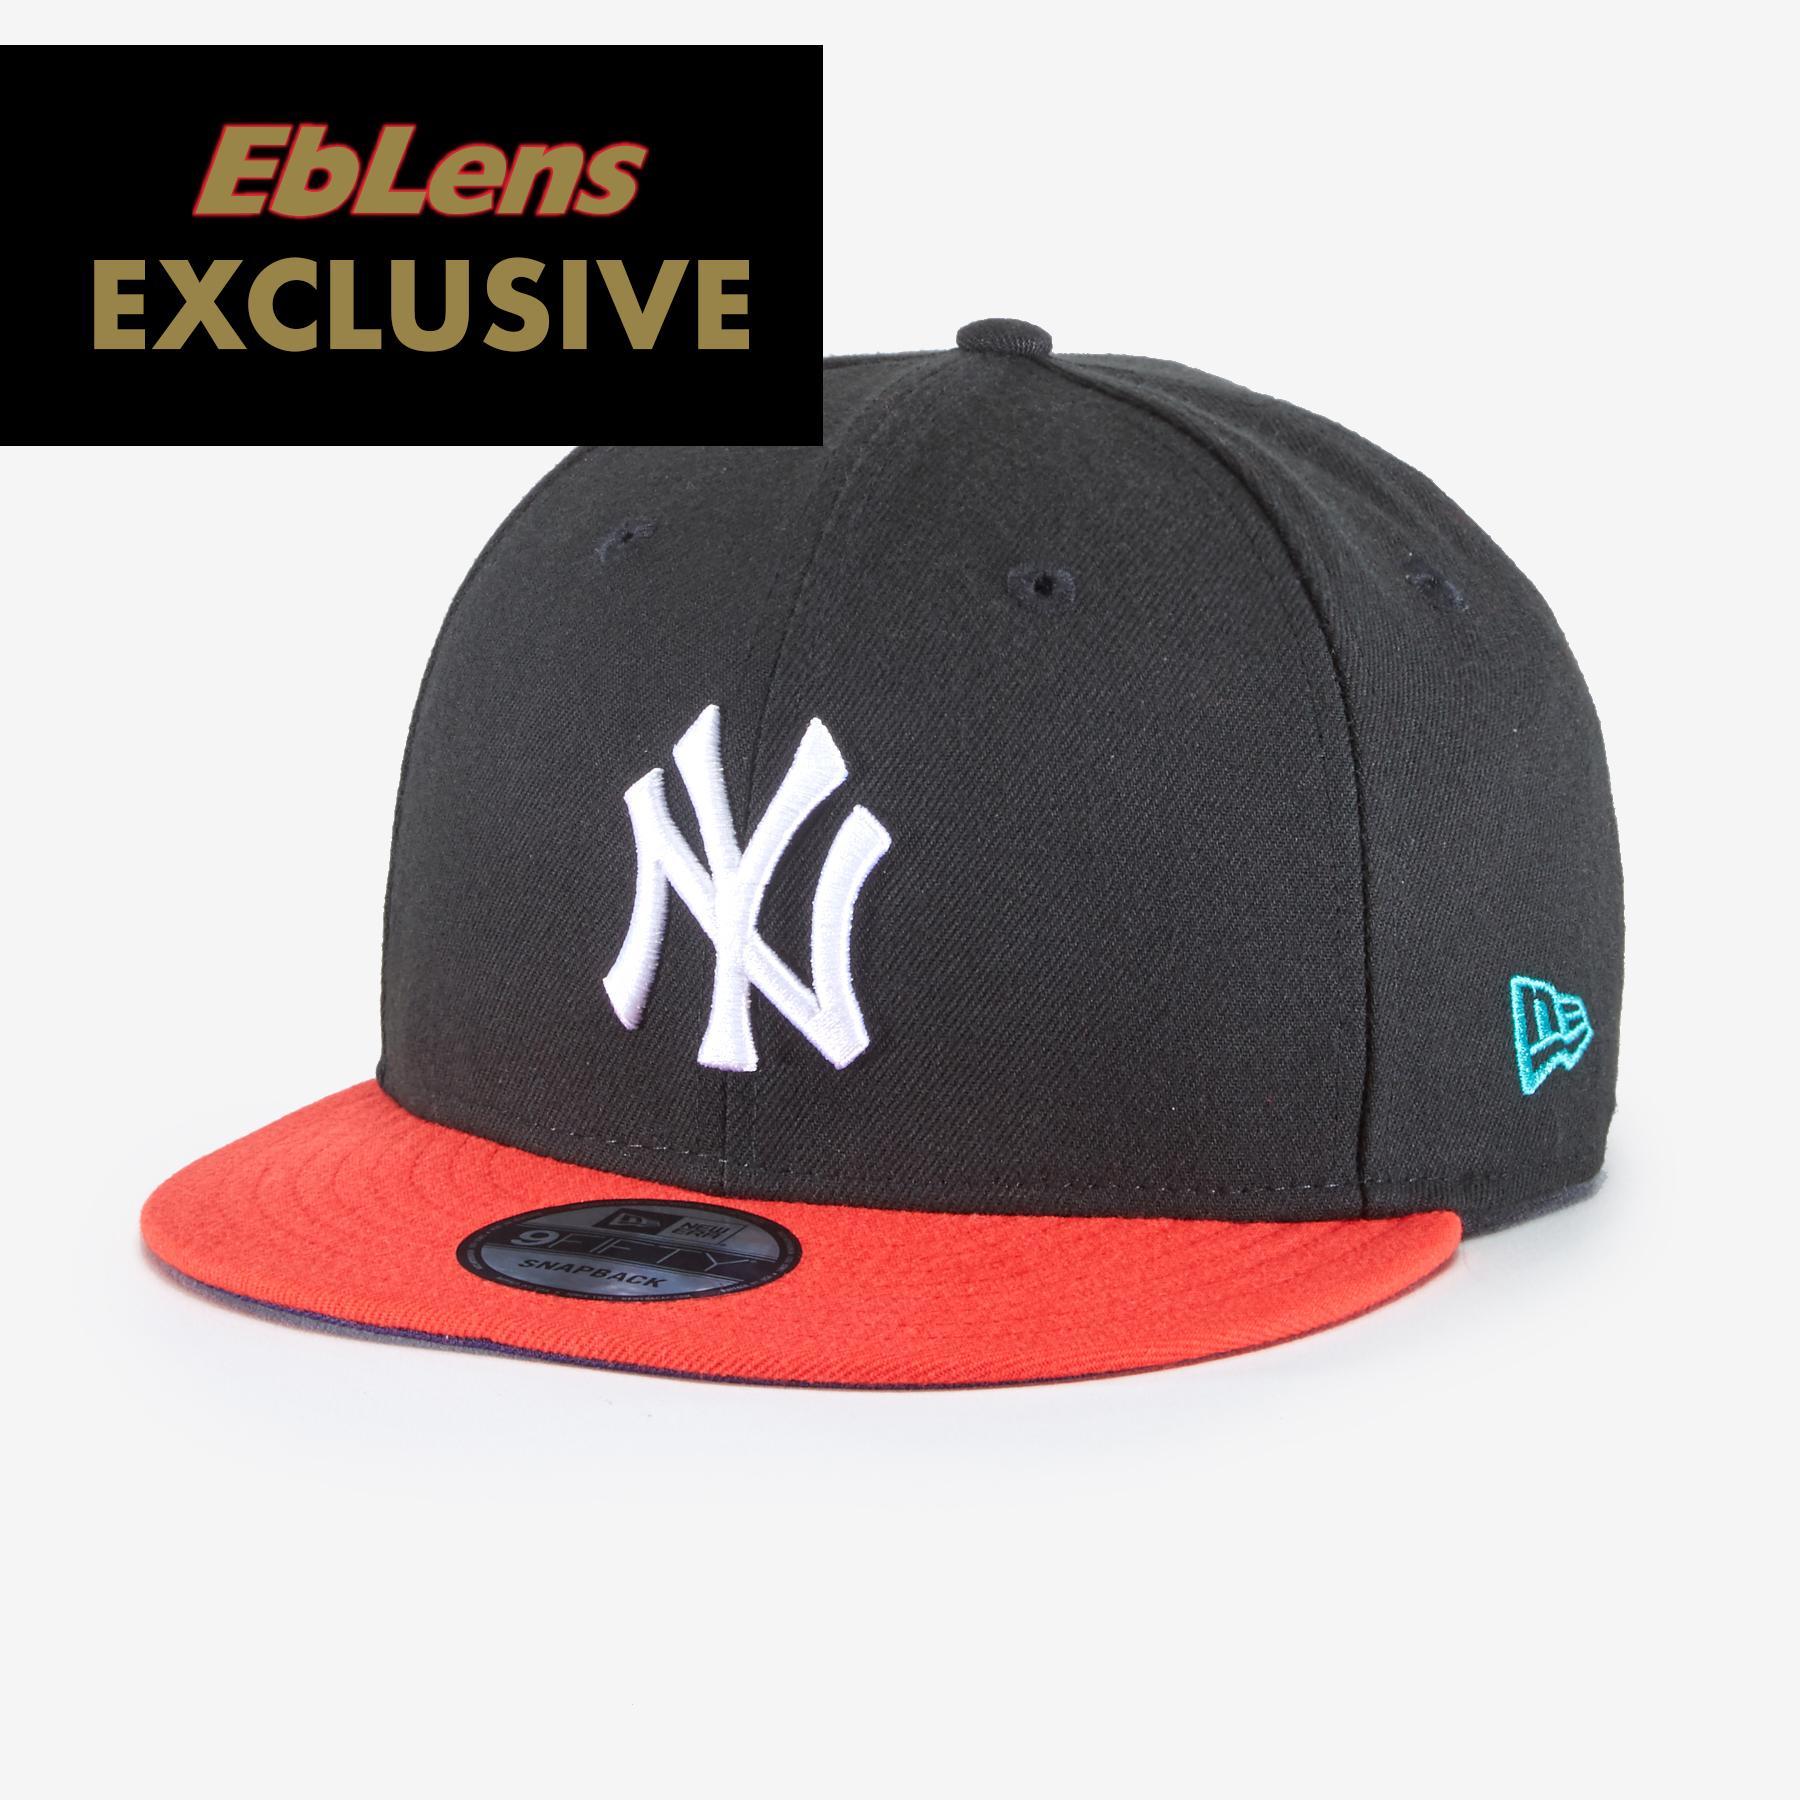 New Era X Eblens Yankees 9fifty Snapback